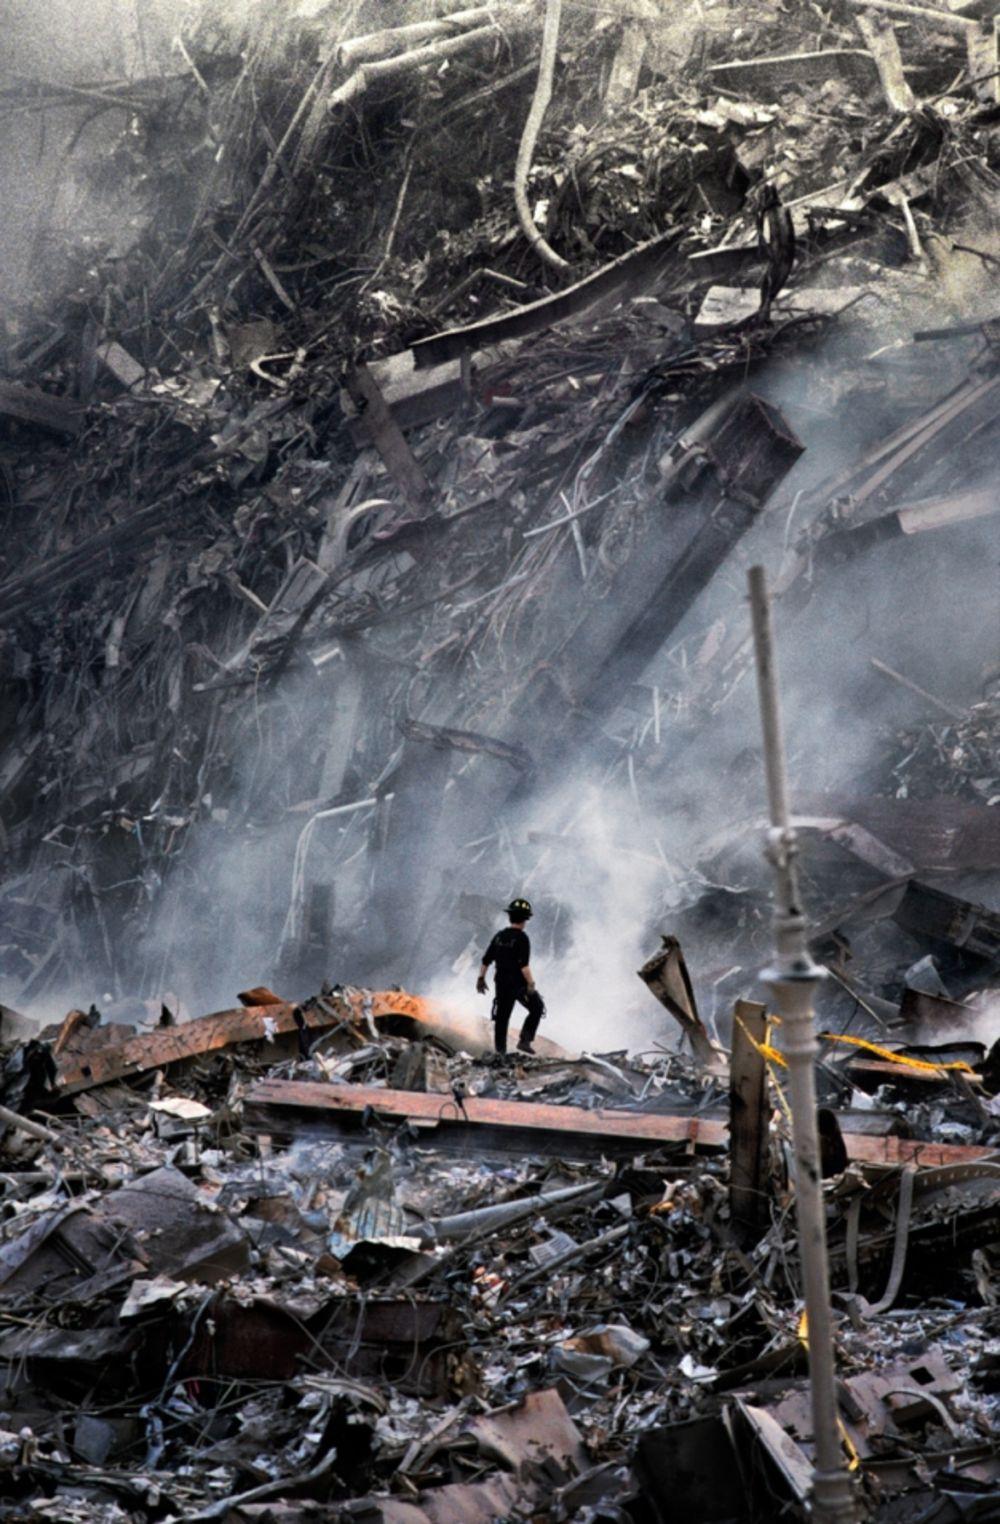 steve-mccurry-11-septembre-policier-alone